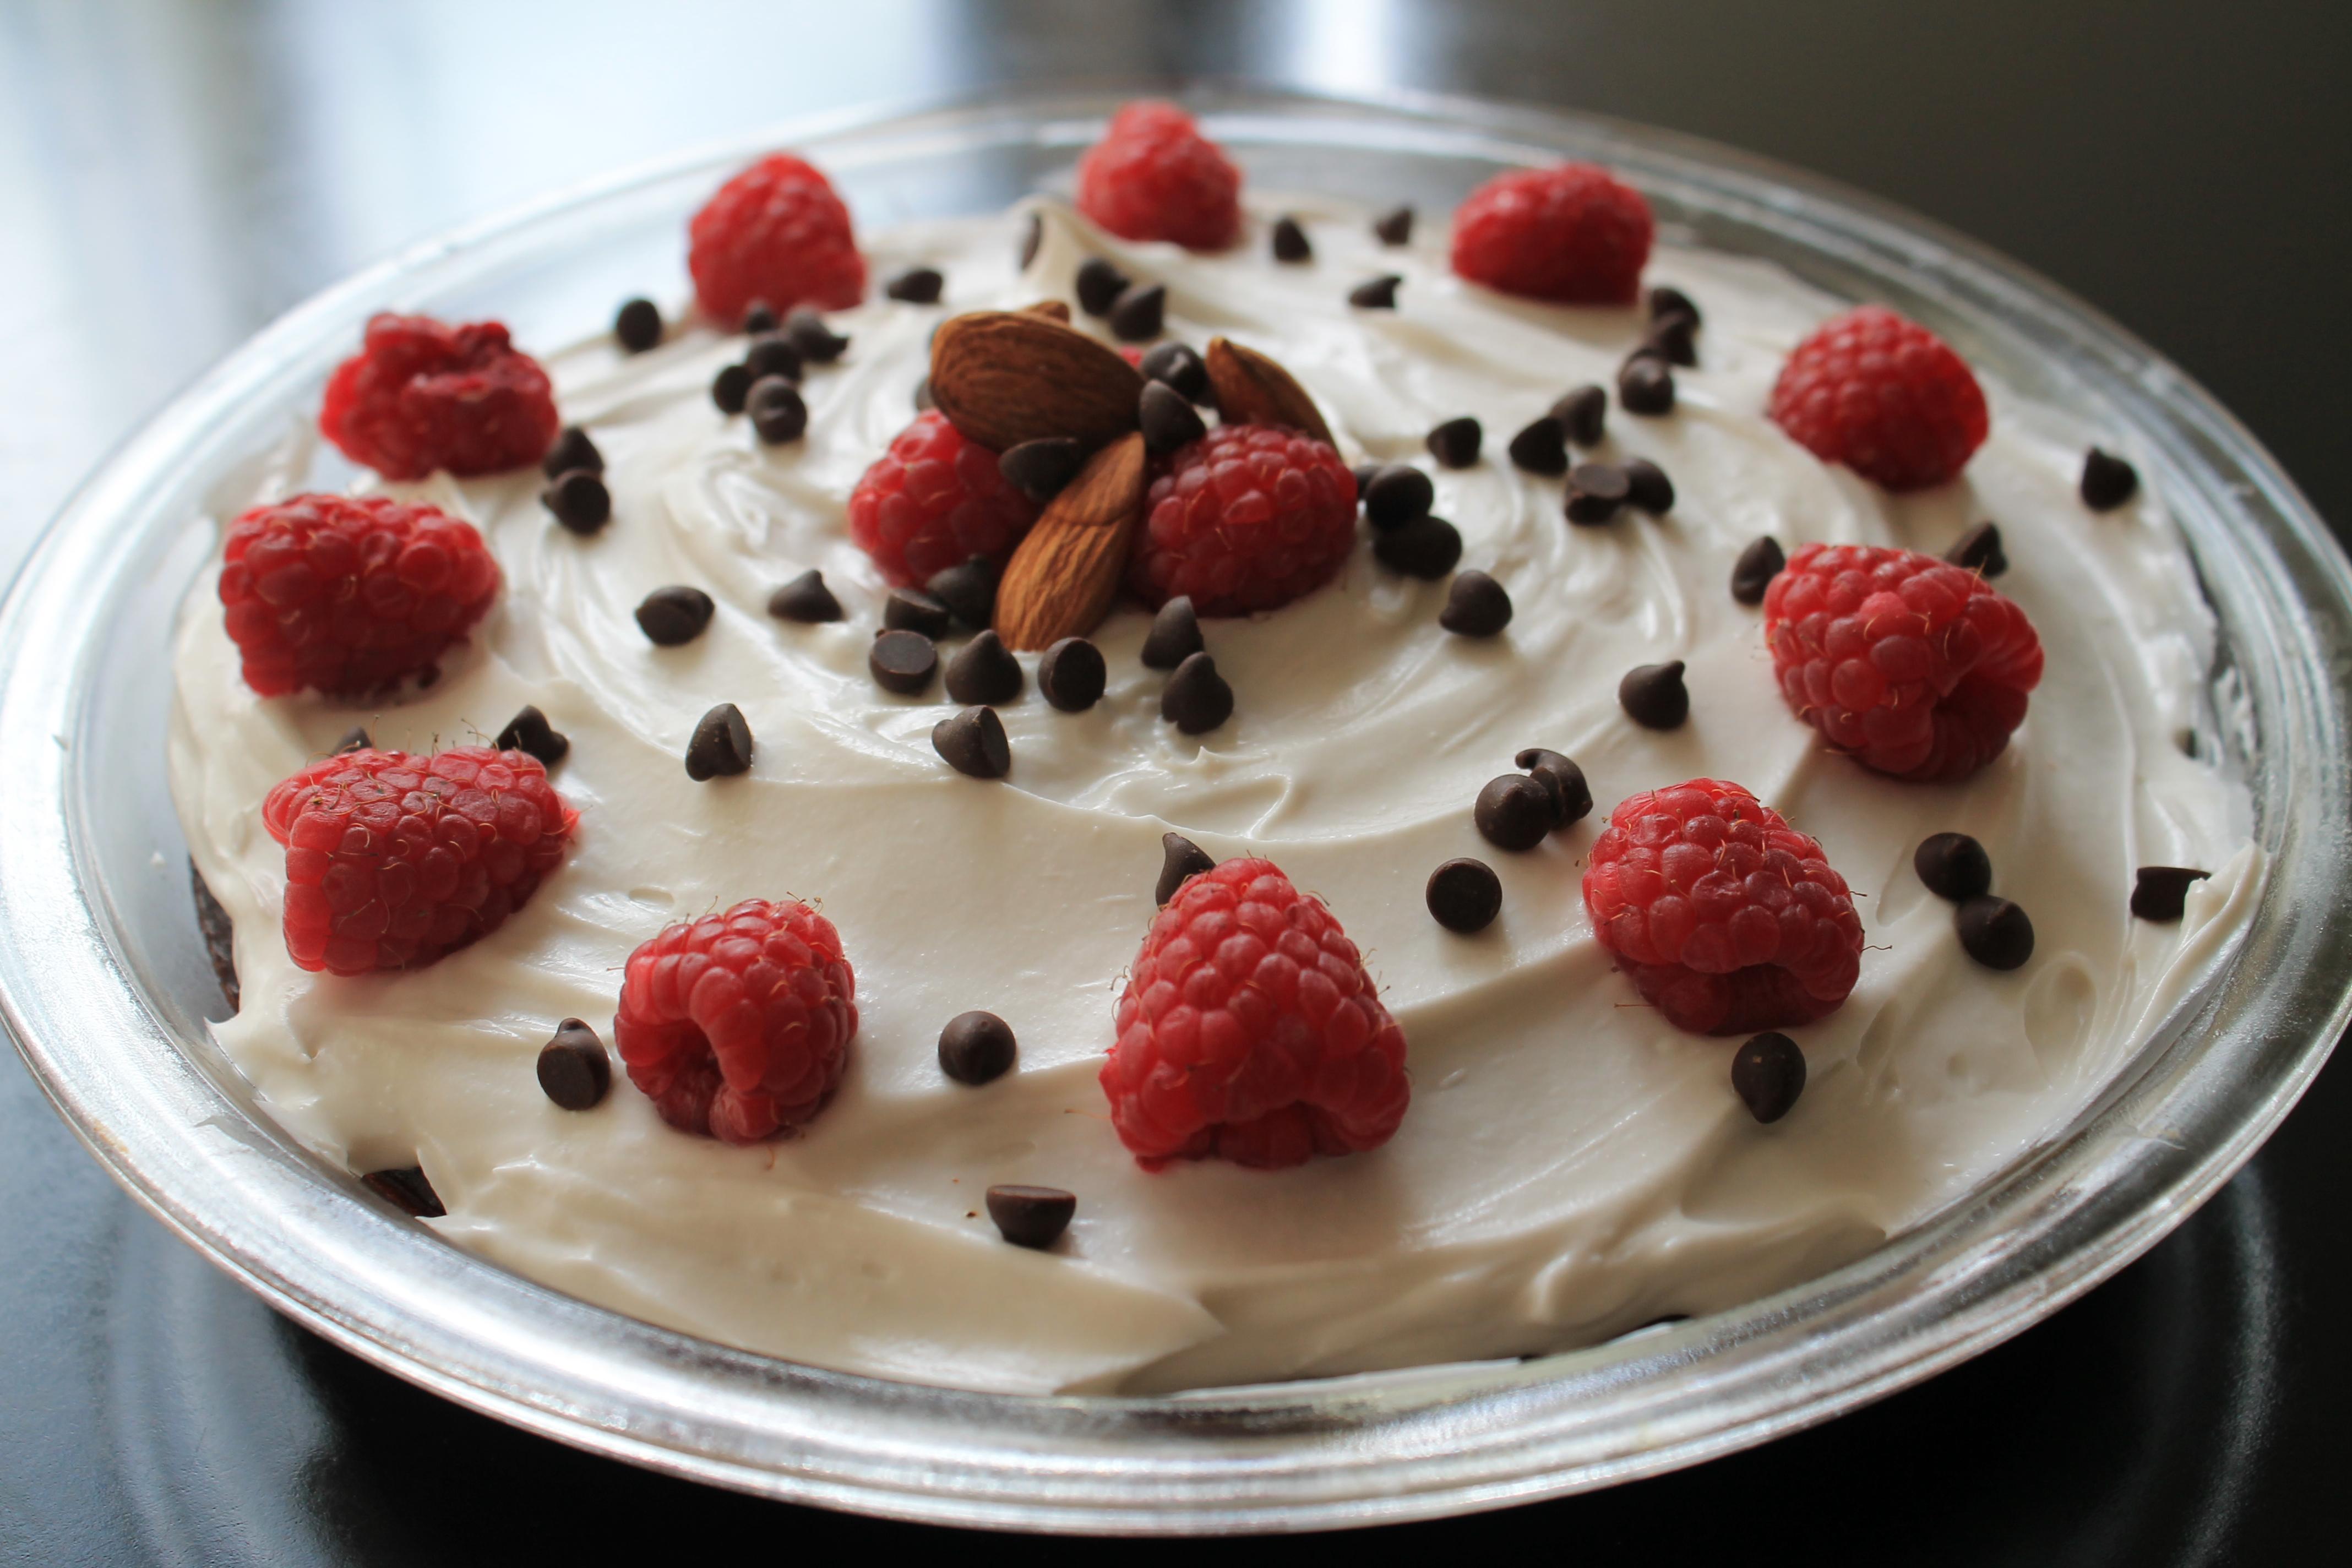 February Birthday Cakes Truebar Inspired Birthday Cake Bakery On Main